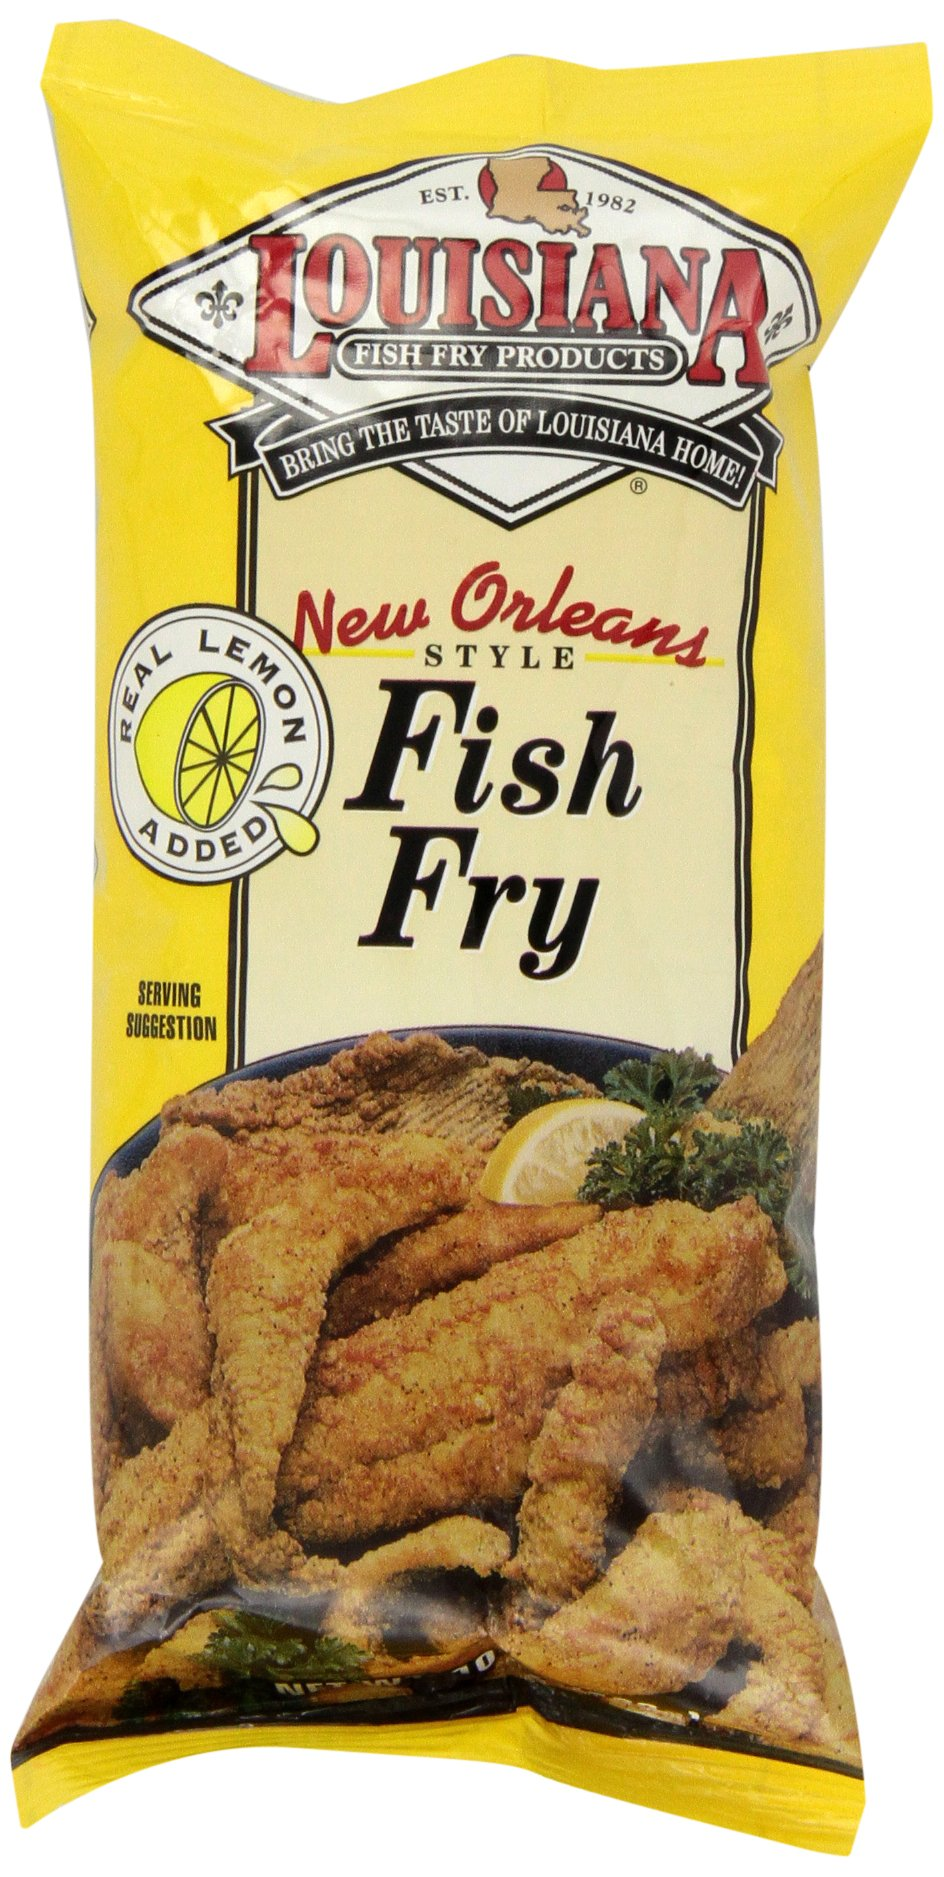 Louisiana Fish Fry Products Lemon Fish Fry Mix, 10 oz